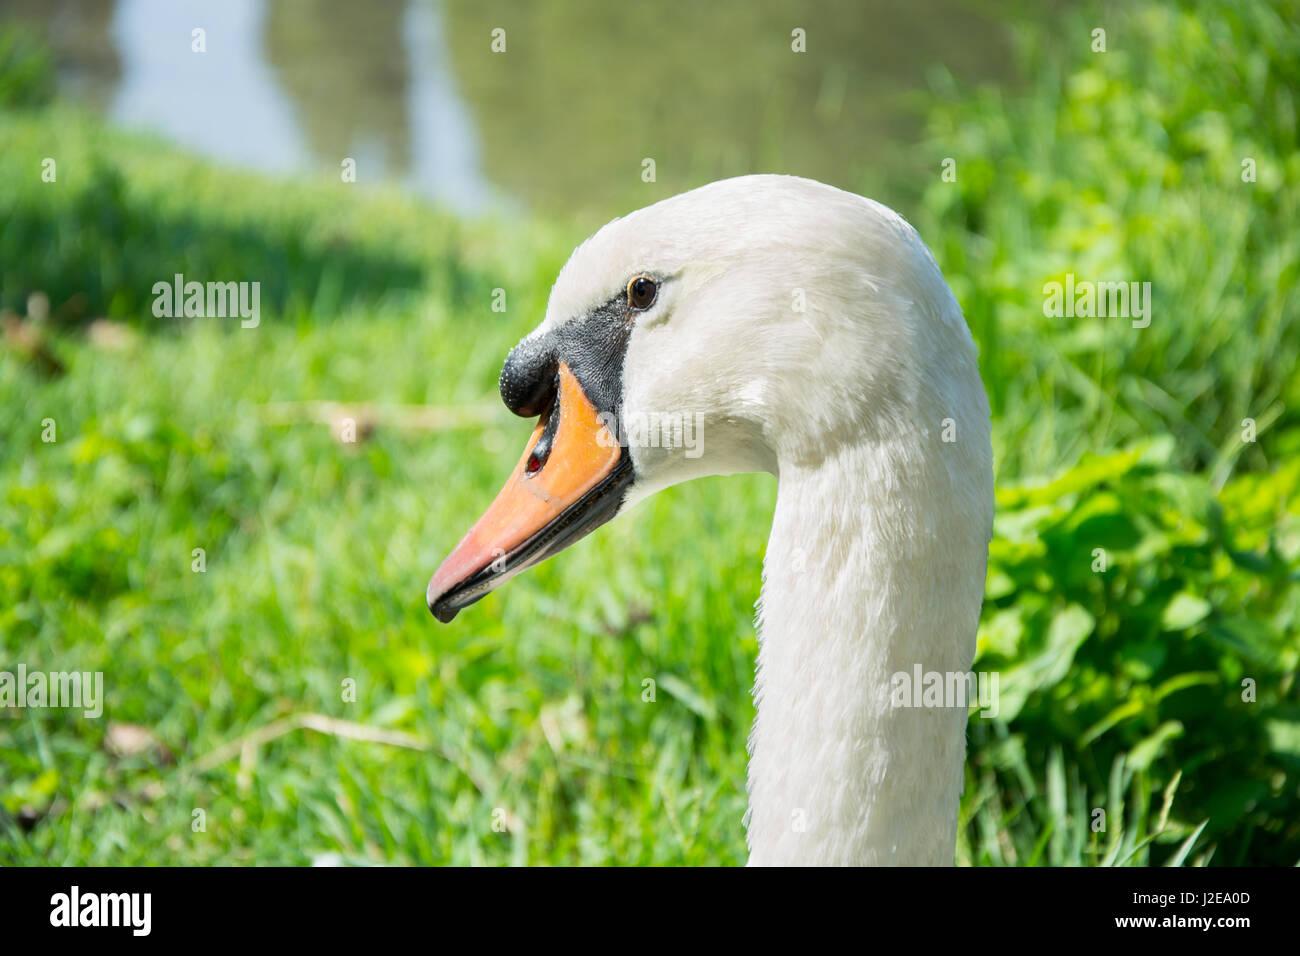 White goose portrait, domestic bird, farm poultry - Stock Image